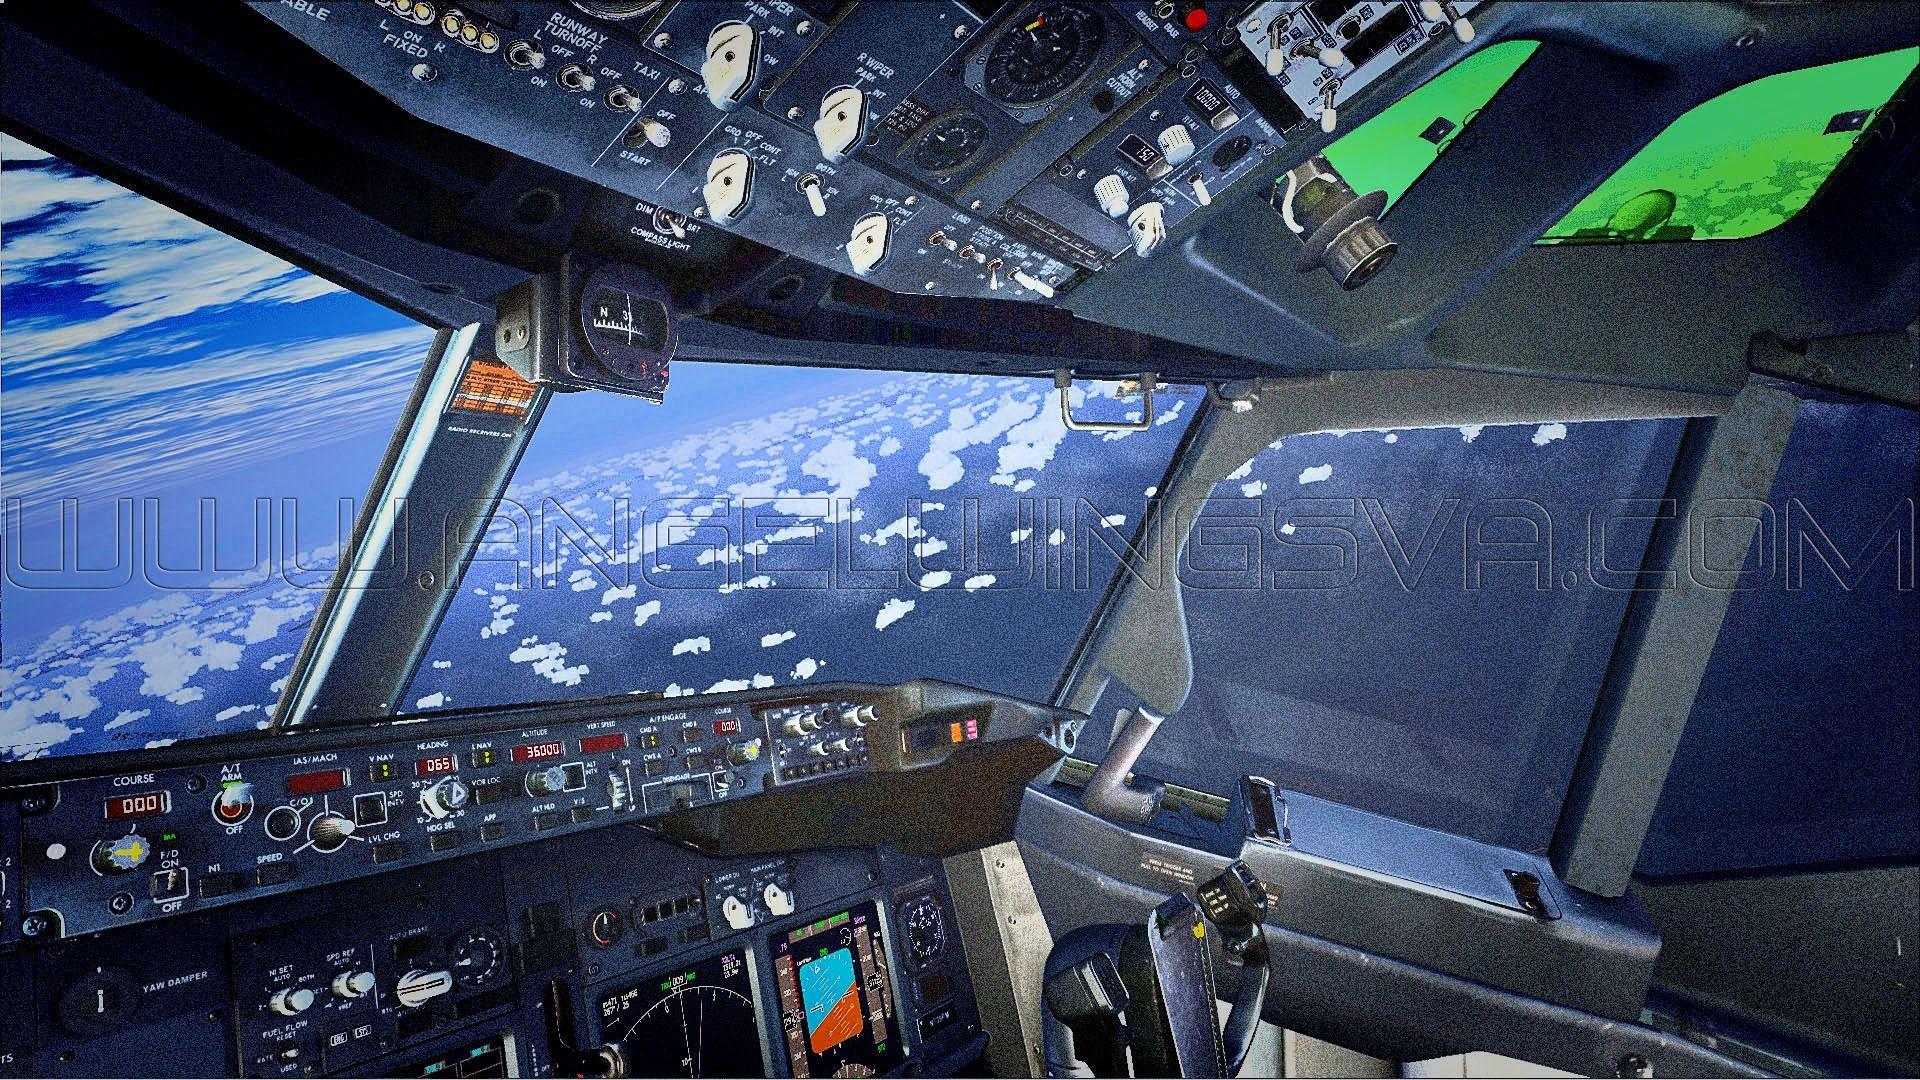 Airbus a380 cockpit wallpaper 68 images - 4k cockpit wallpaper ...